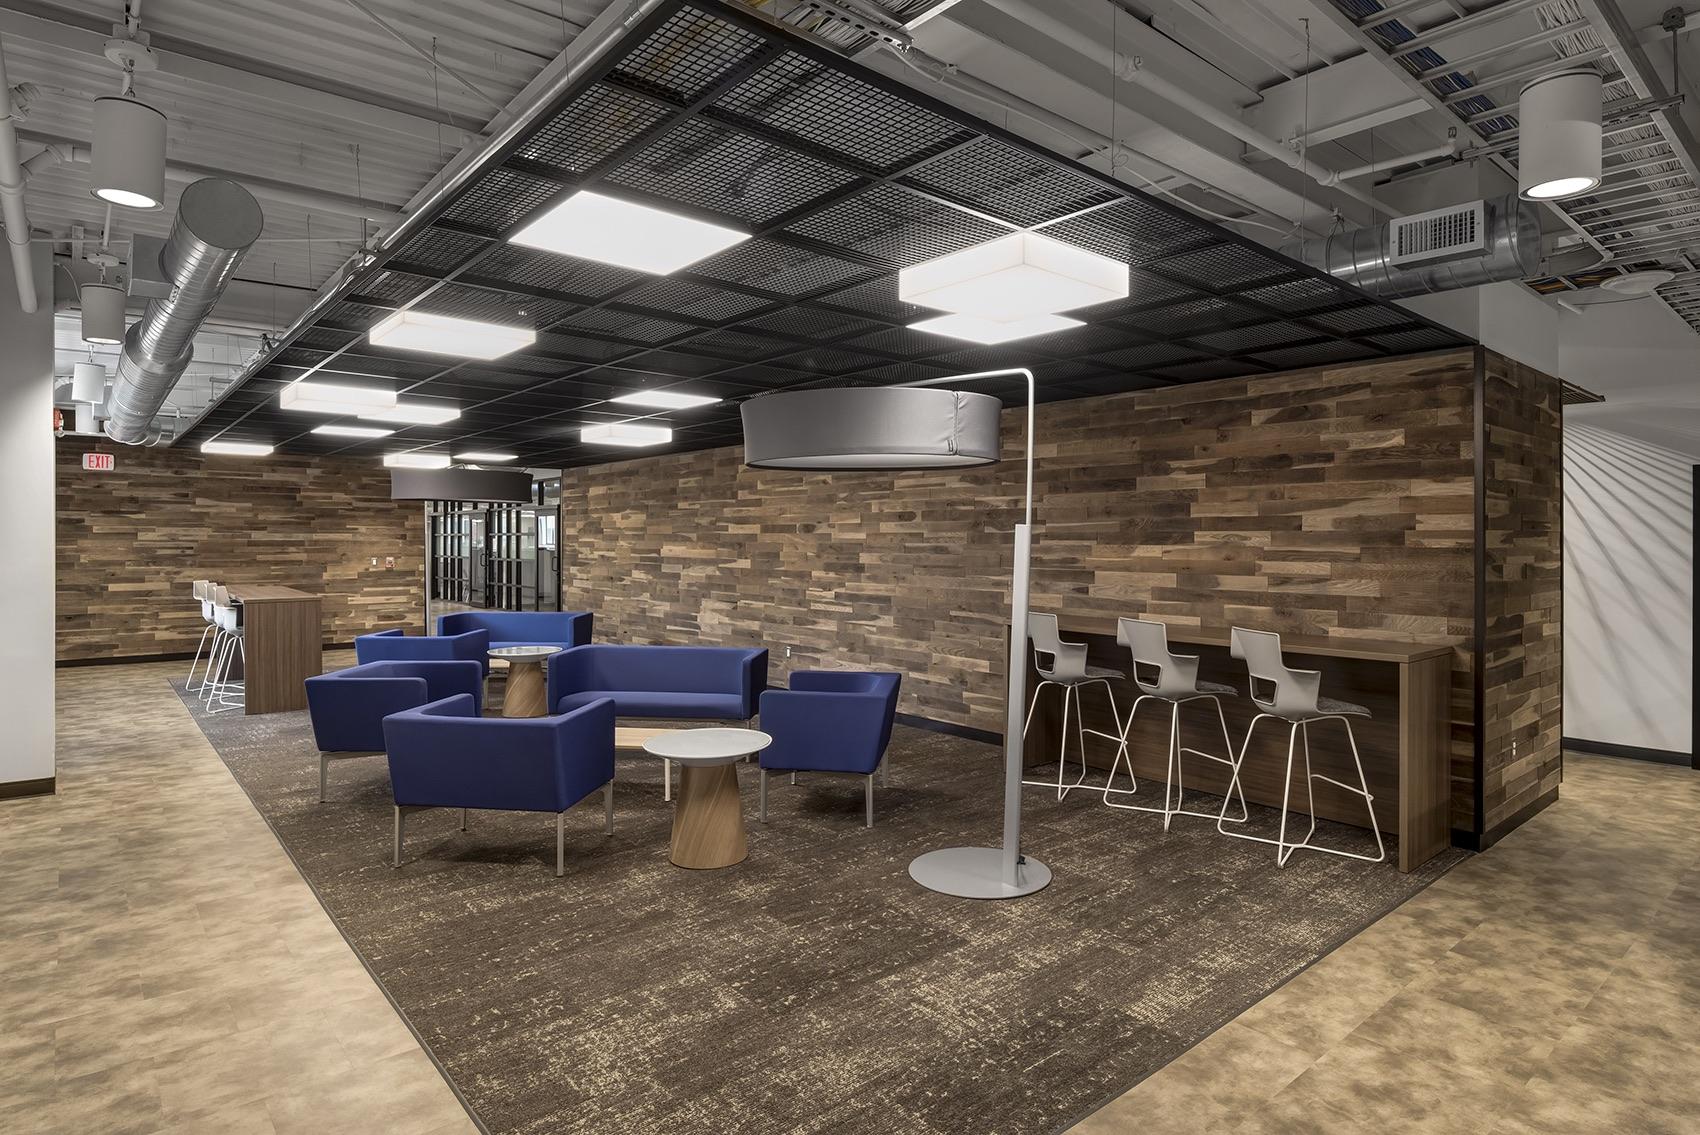 detroit-diesel-office-5